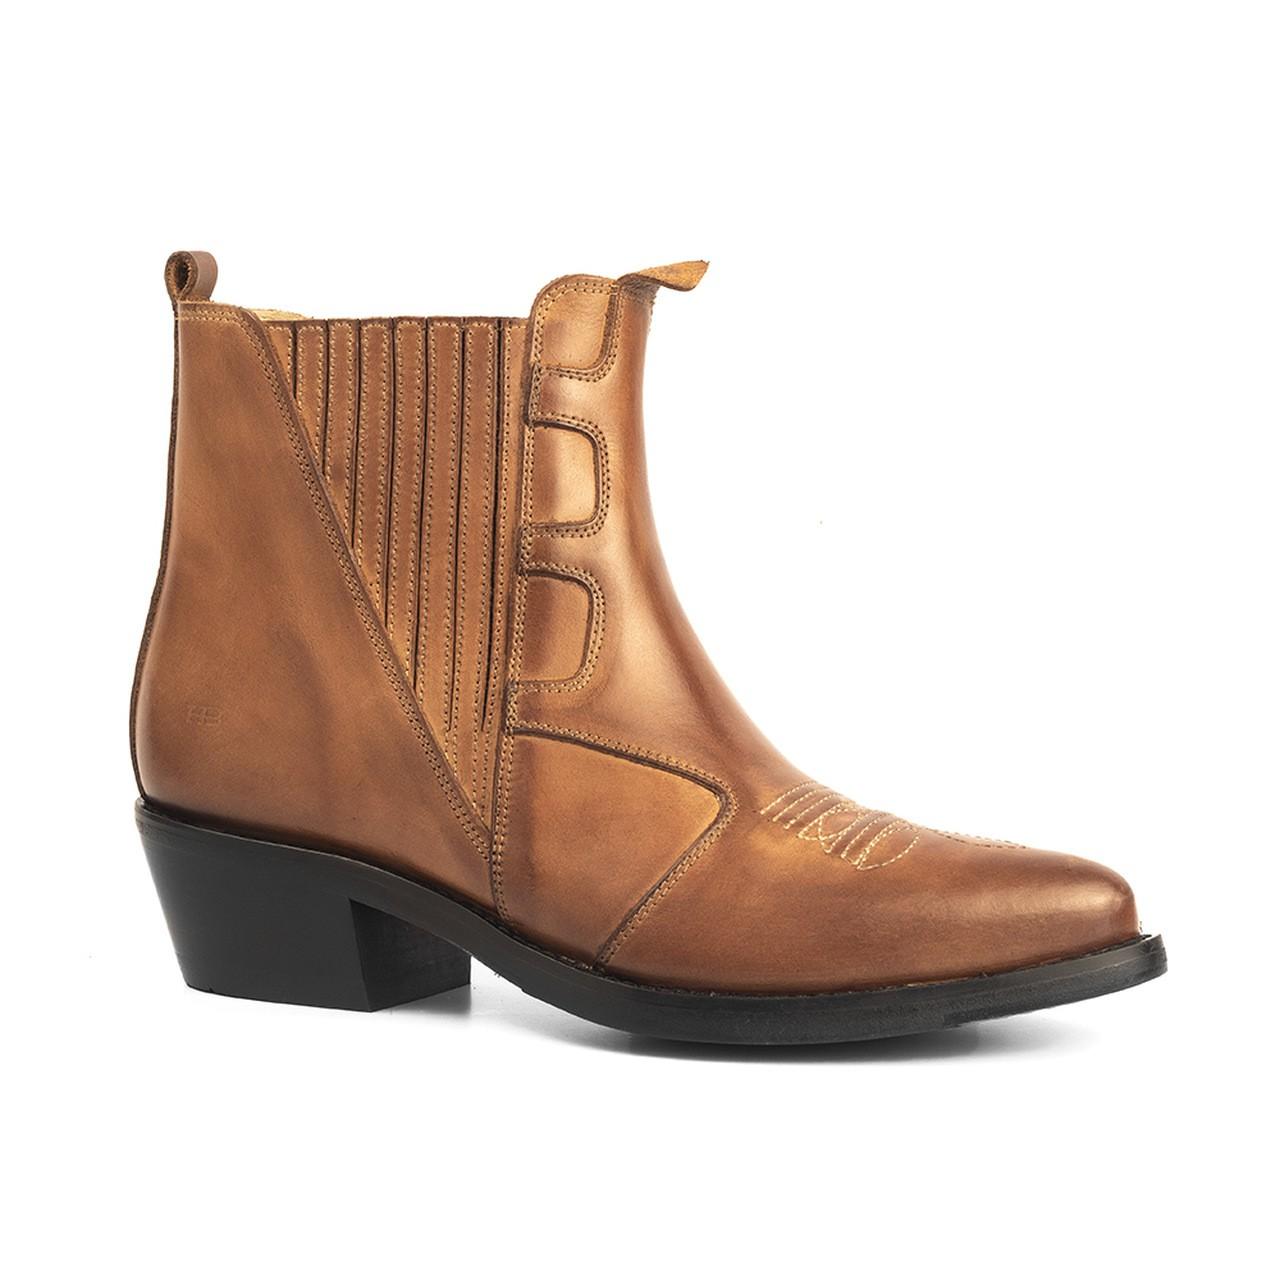 Bota Masculina Country Texana HB Agabe Boots 100.003 - Lt Havana - Sola de Couro Com Borracha